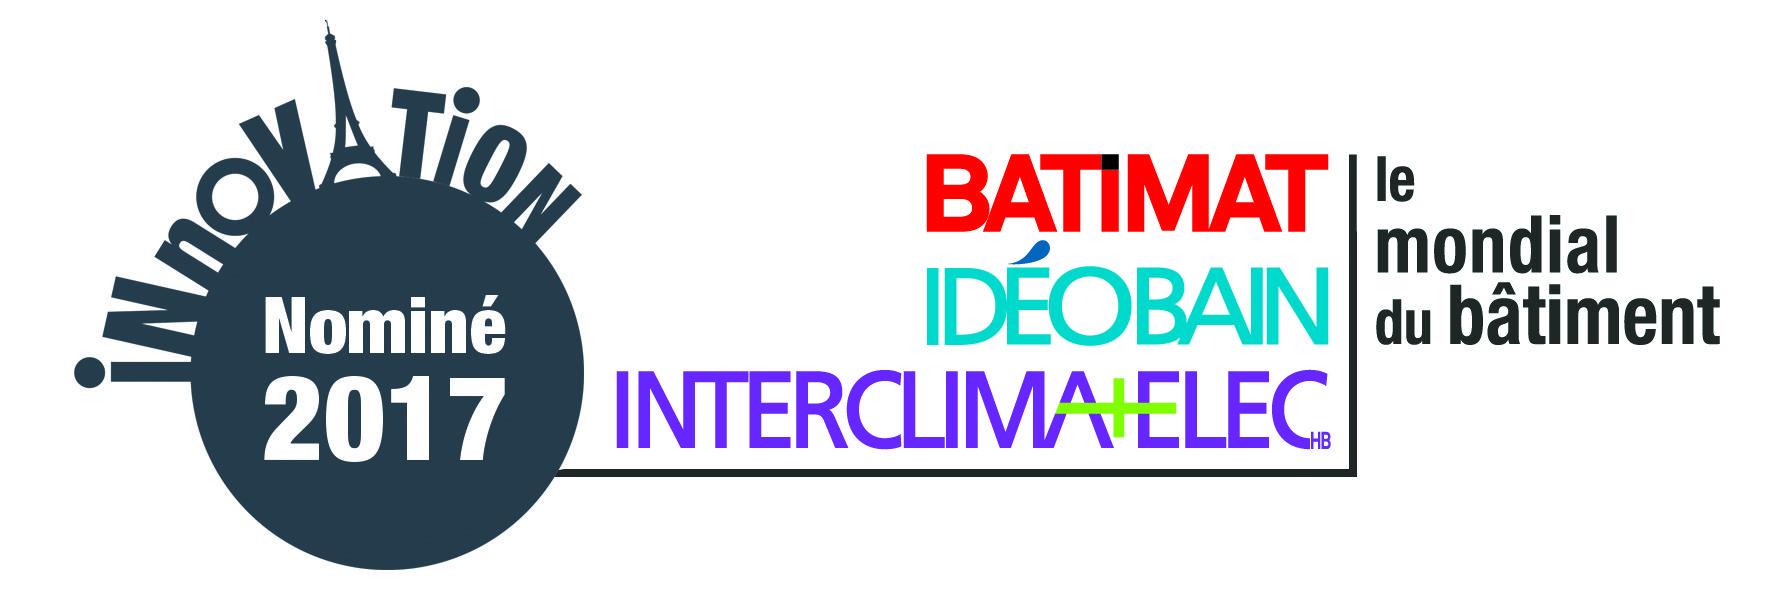 Logo concours innovation Batimat 2017